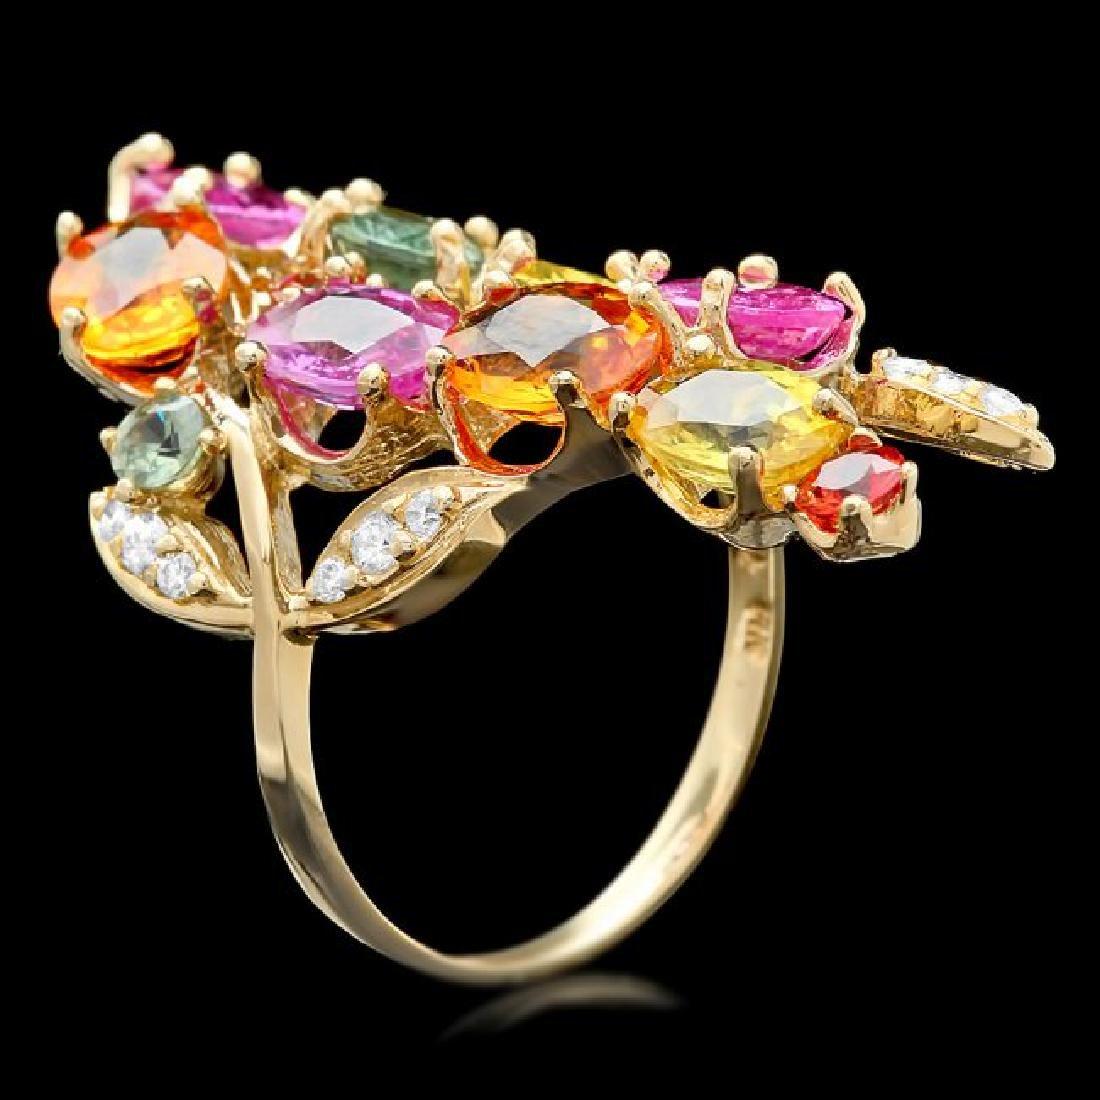 14k Gold 8.8ct Sapphire 0.20ct Diamond Ring - 2